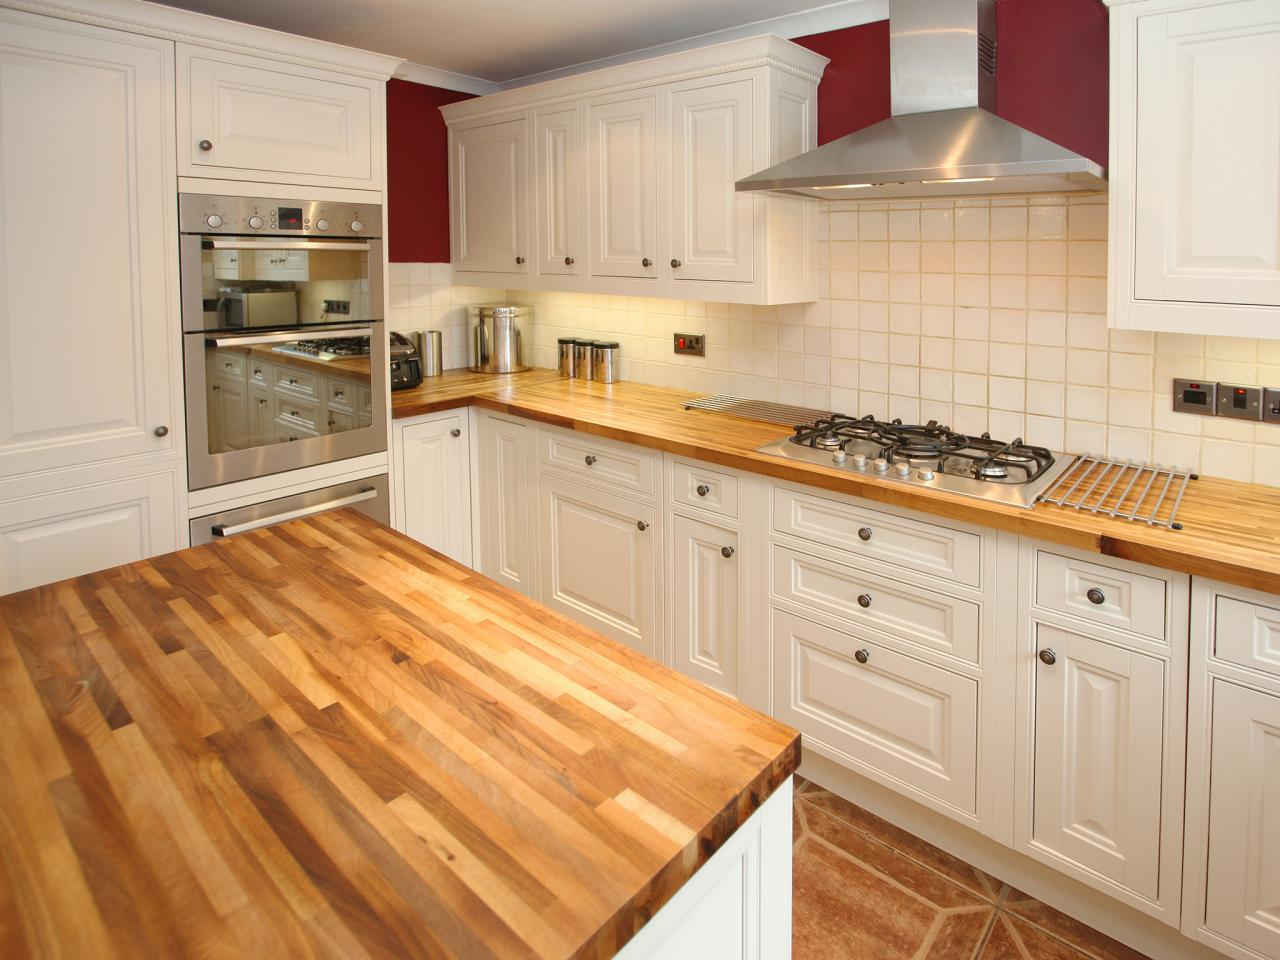 kitchen counter tops wood kitchen countertops YWRZGJX